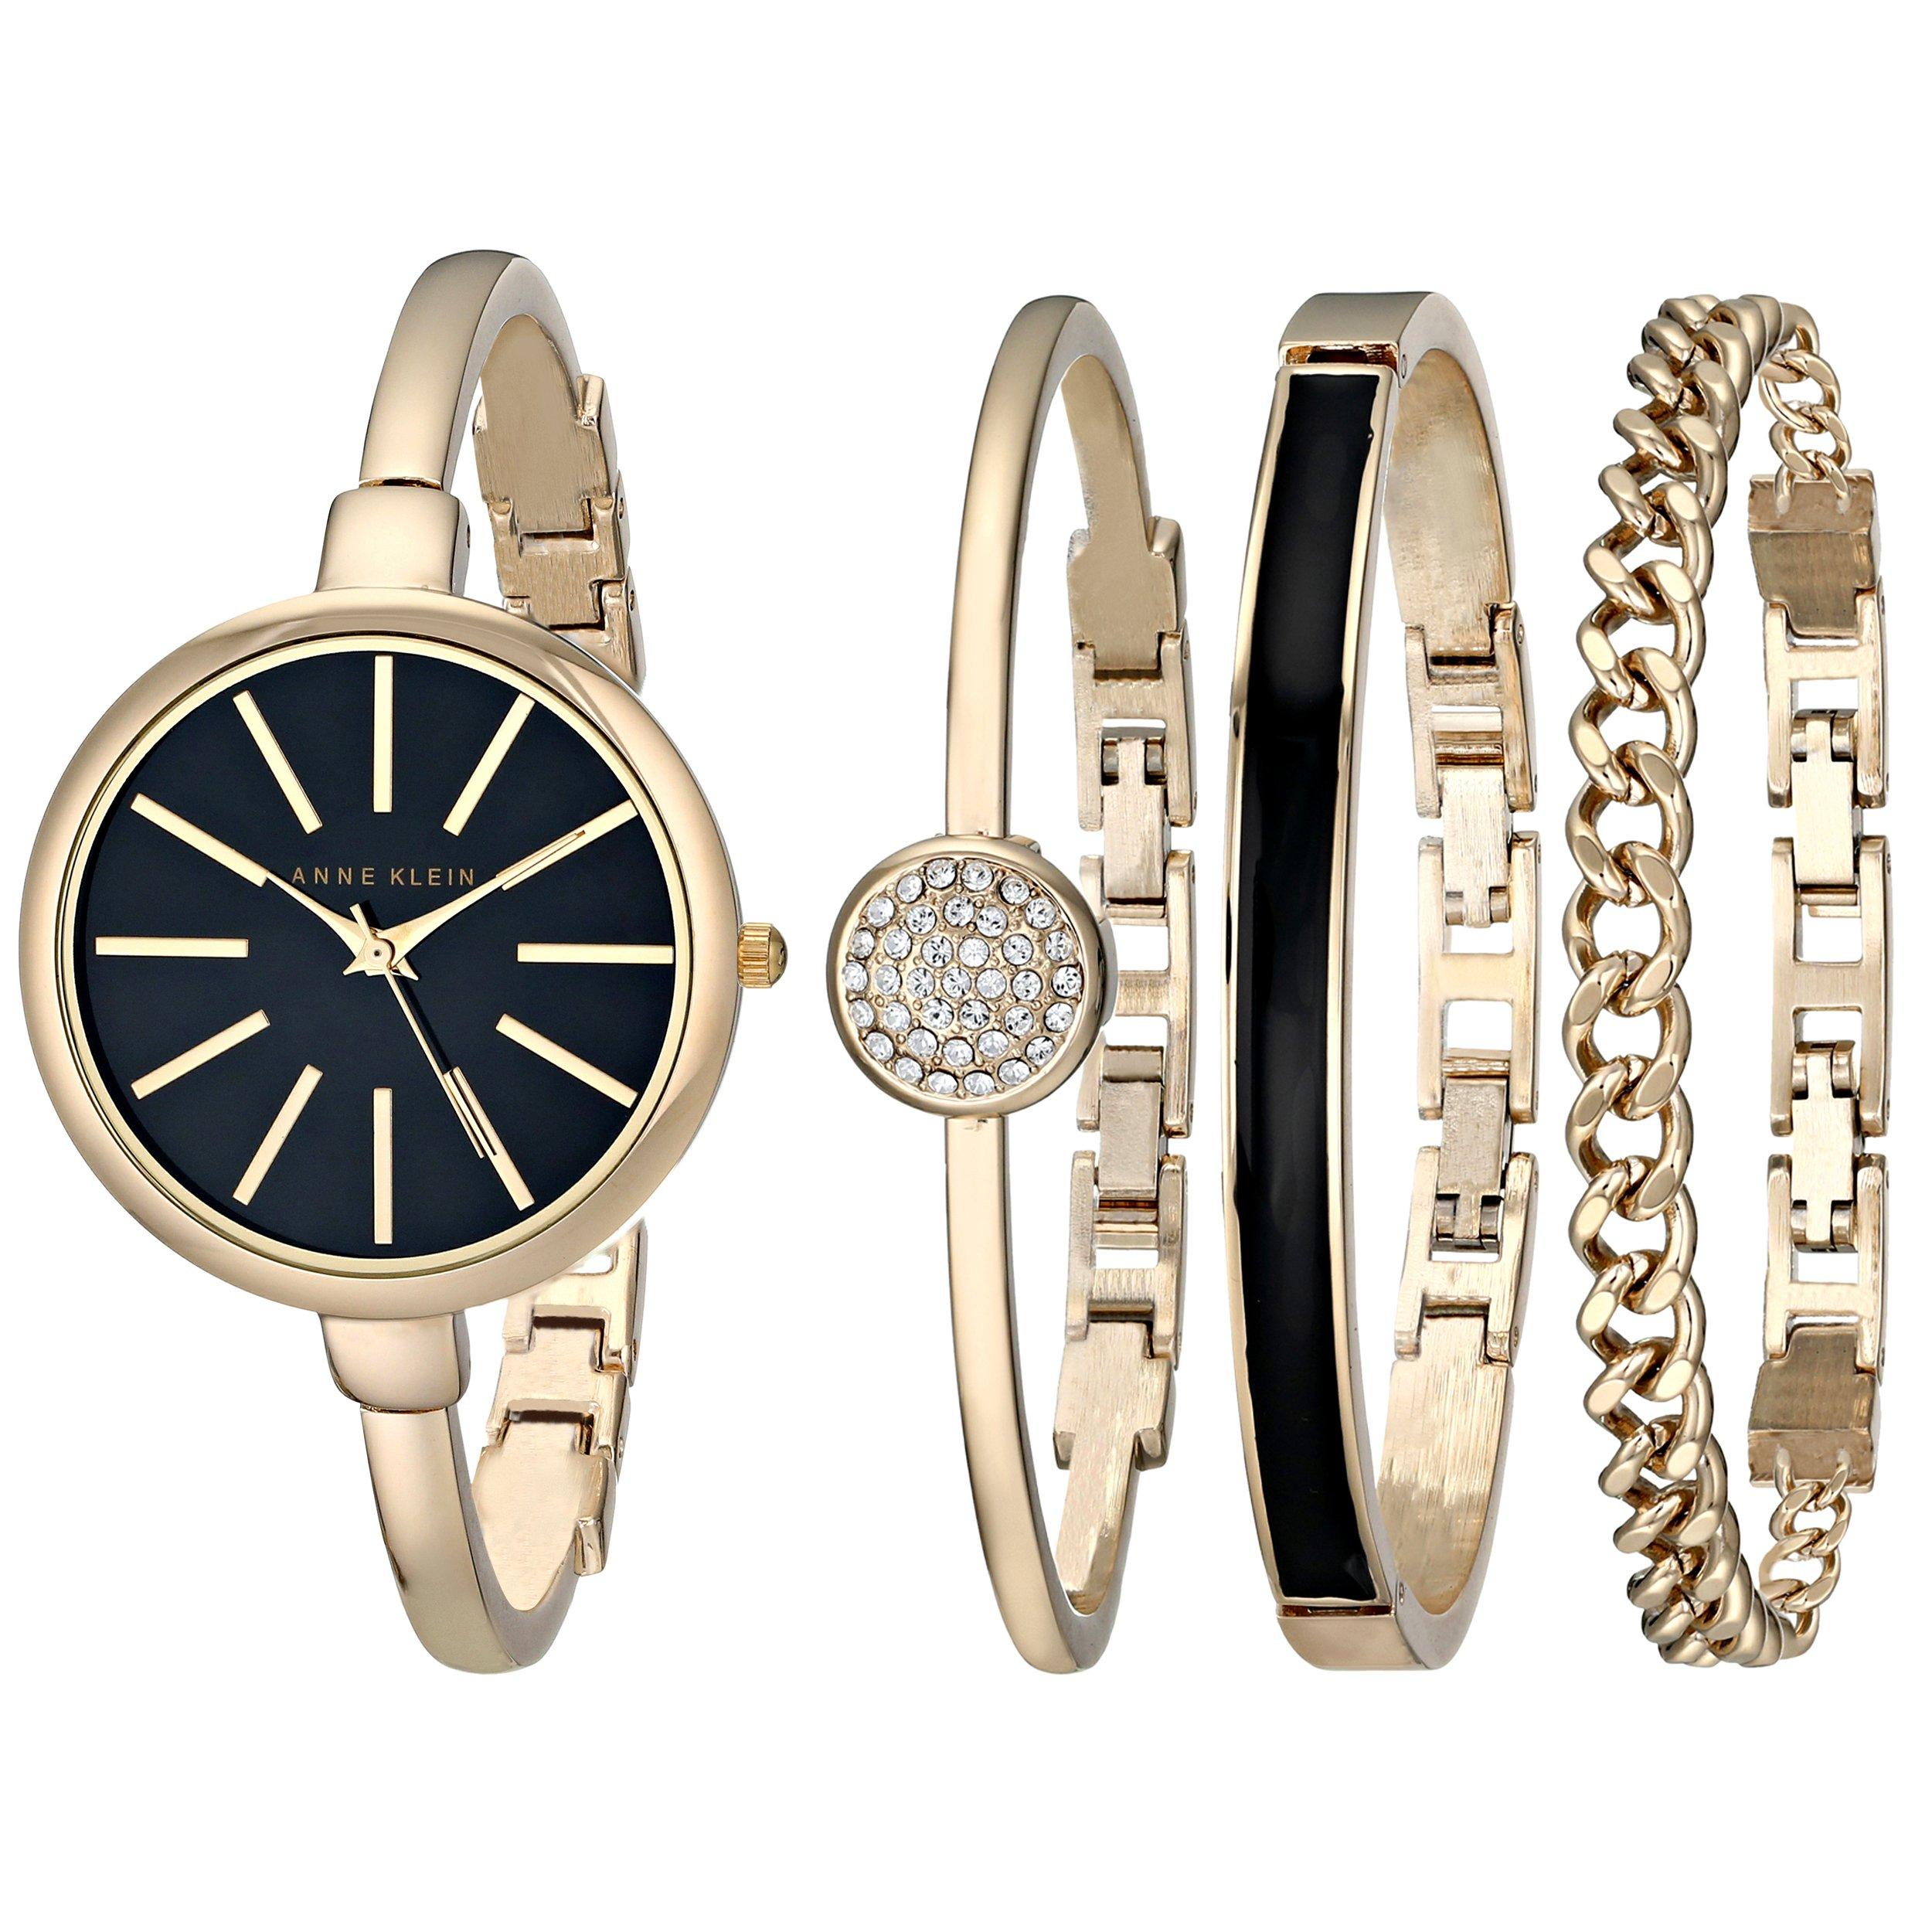 Anne Klein Women's AK/1470GBST Gold-Tone Watch and Bracelet Set by Anne Klein